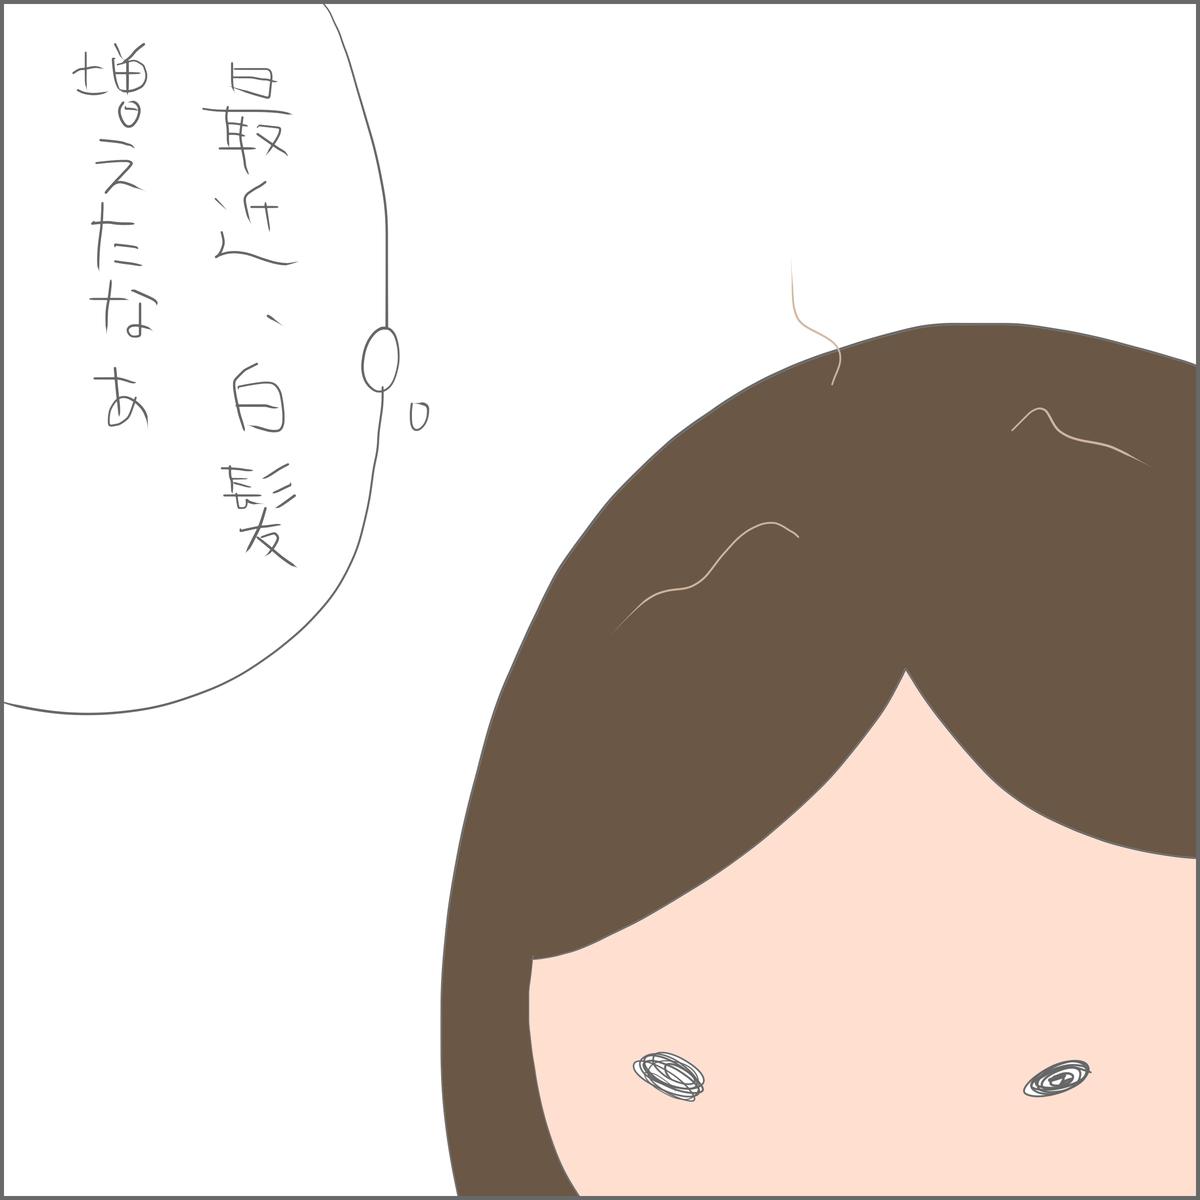 f:id:ika_yoshi:20210917235740j:plain